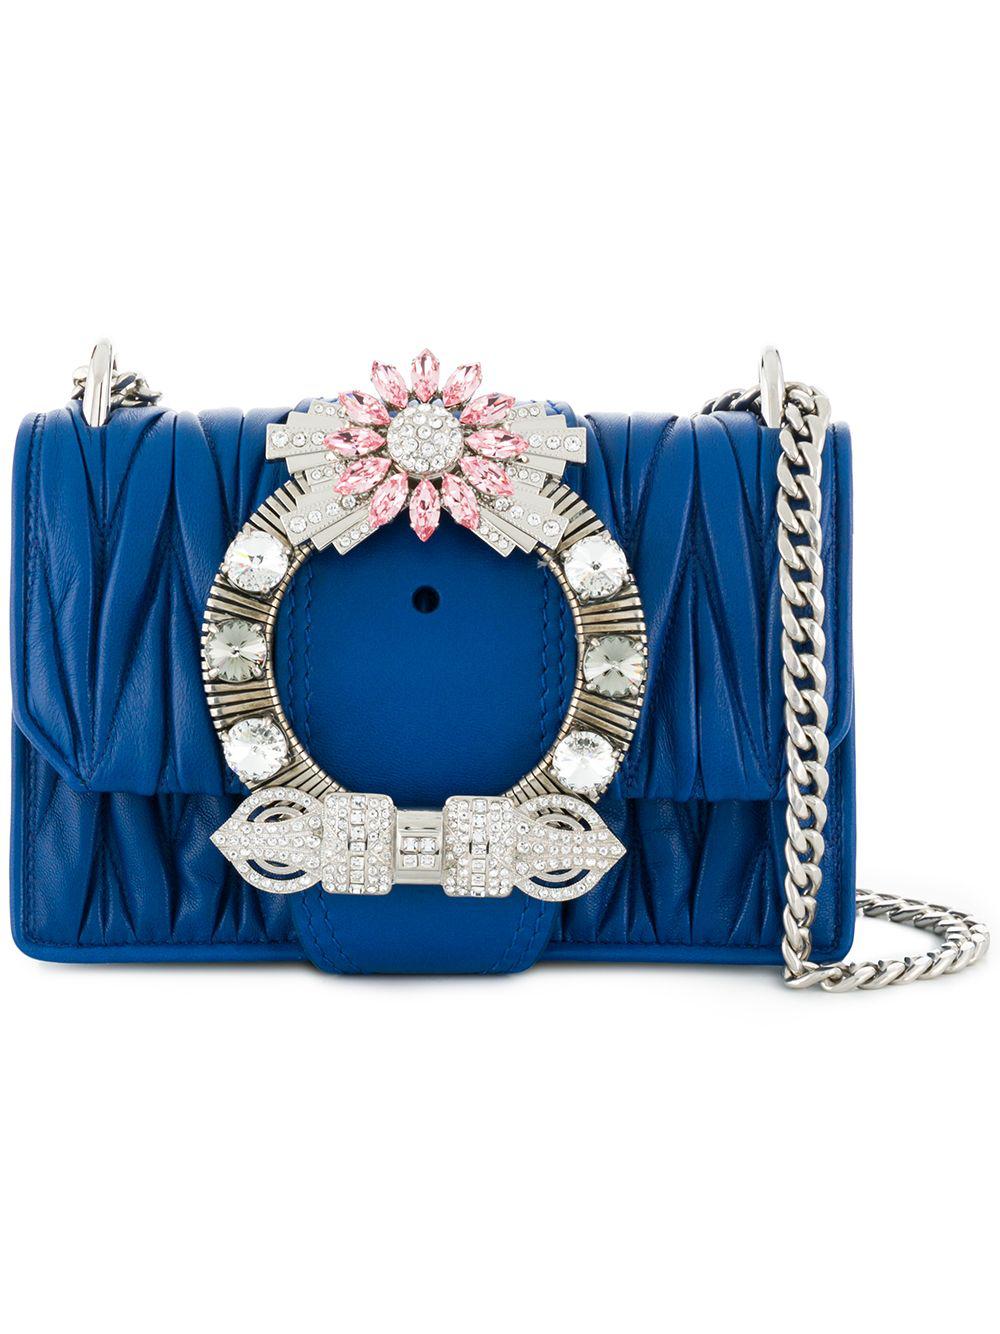 84429a64d090 Miu Miu Miu Lady Crossbody Bag - Blue. Farfetch